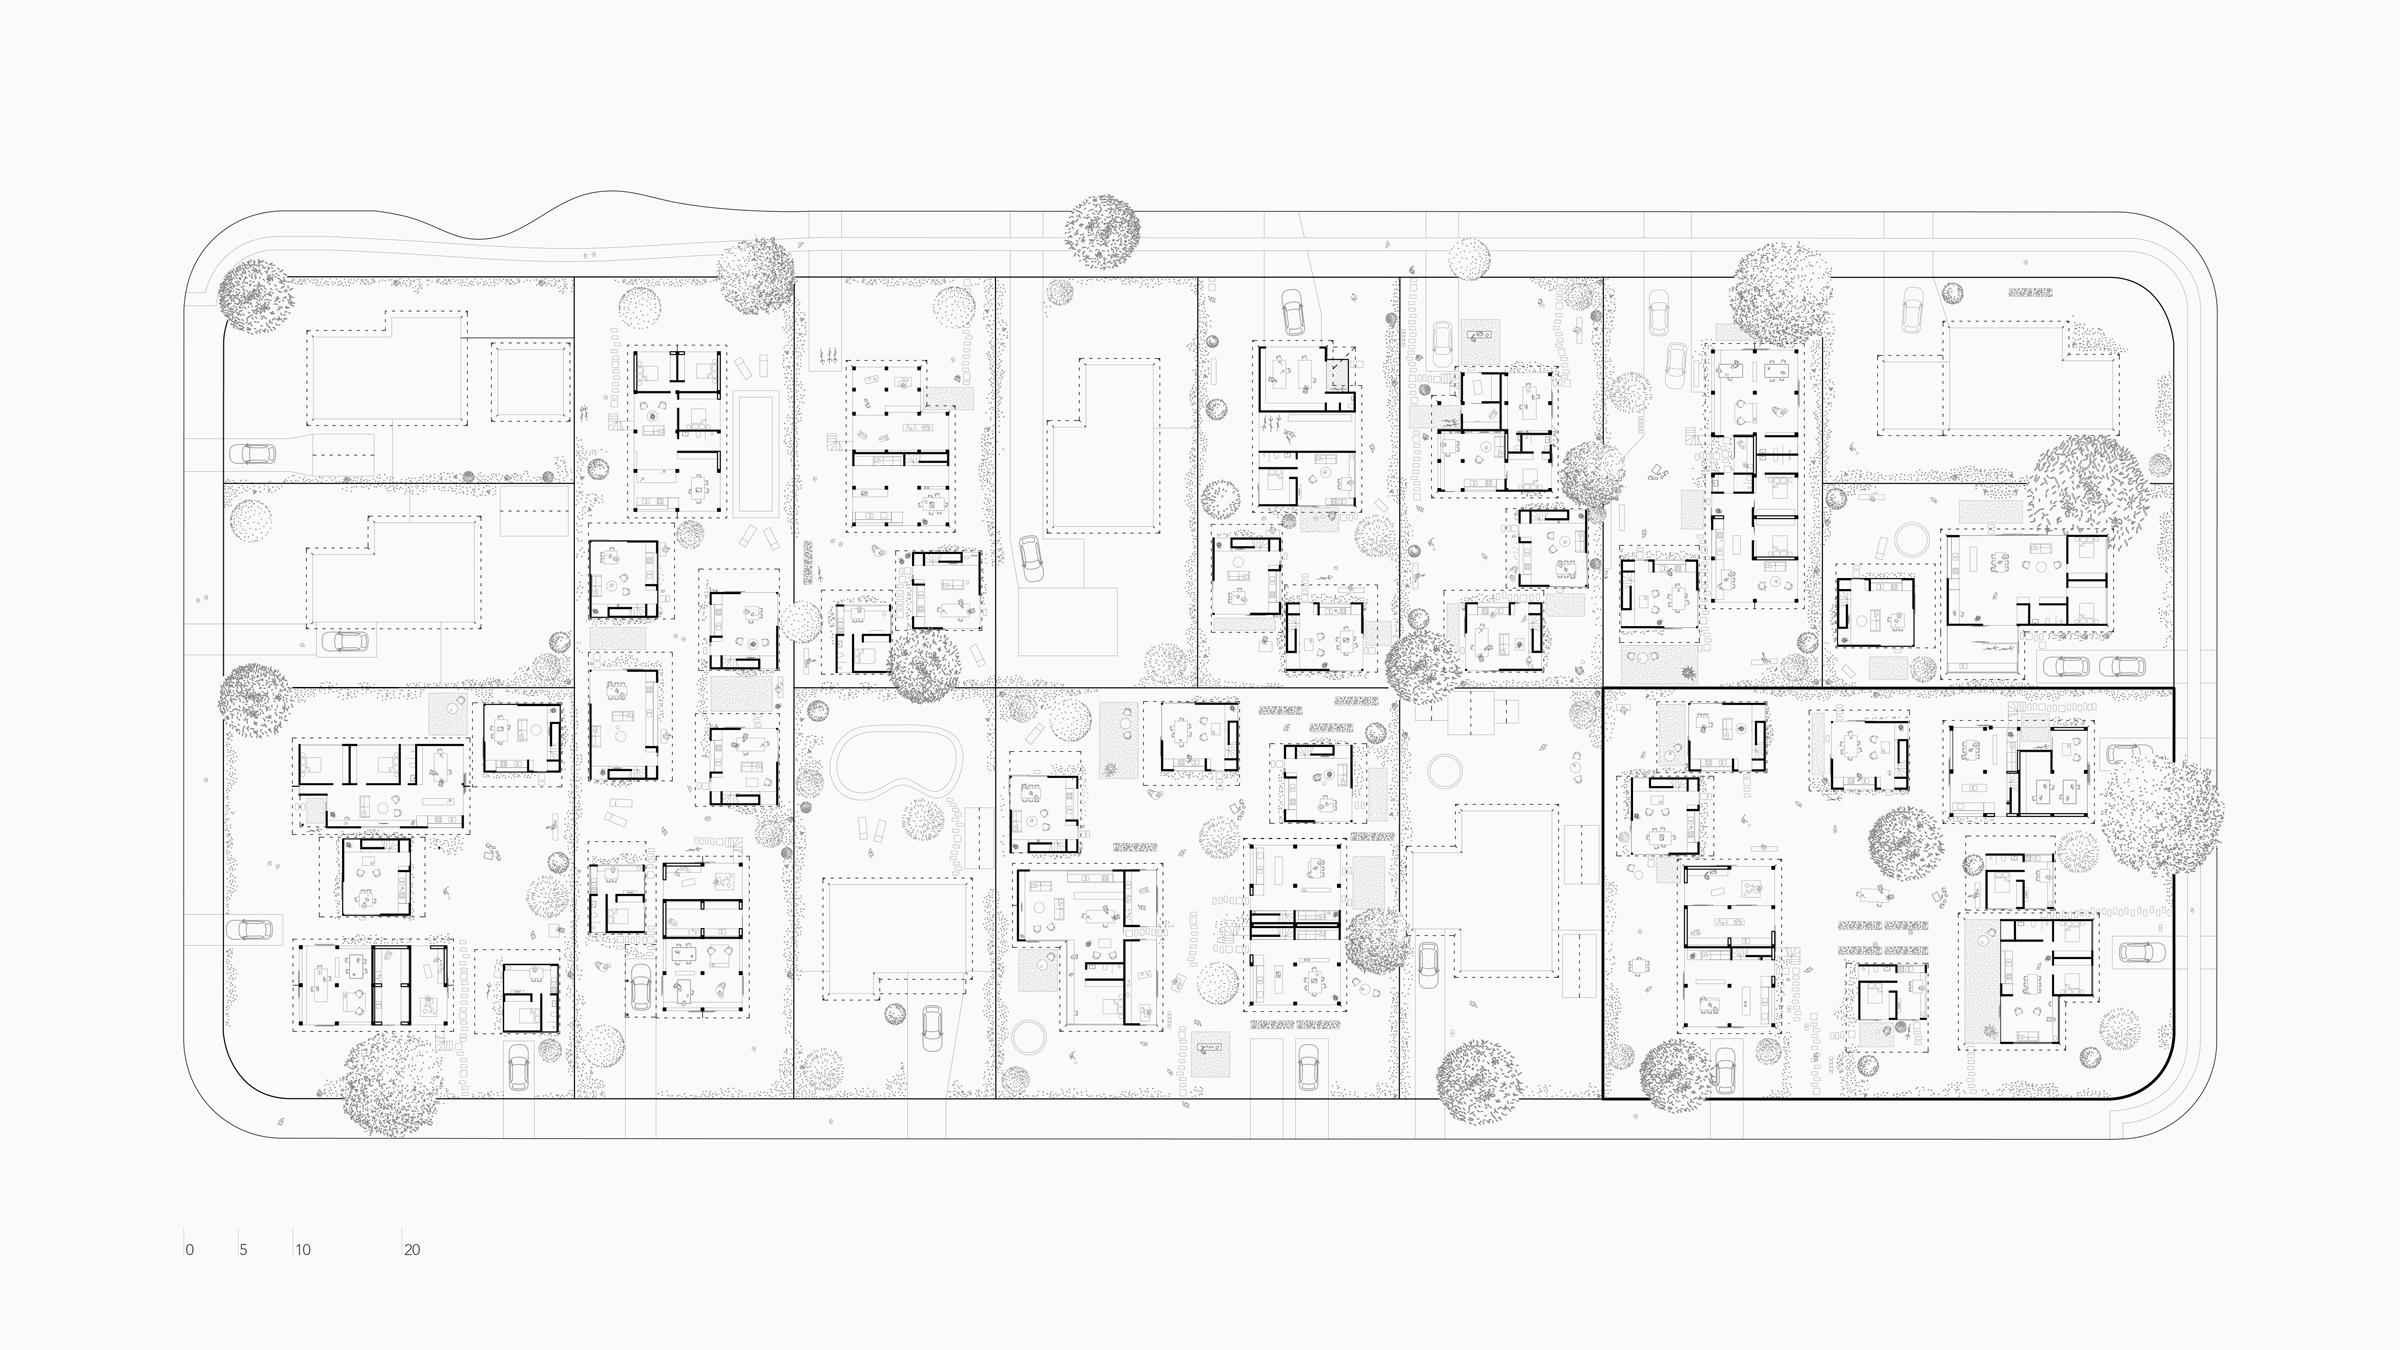 171212-Dappled-Dwellings-Site-Plan-Stage-07.jpg